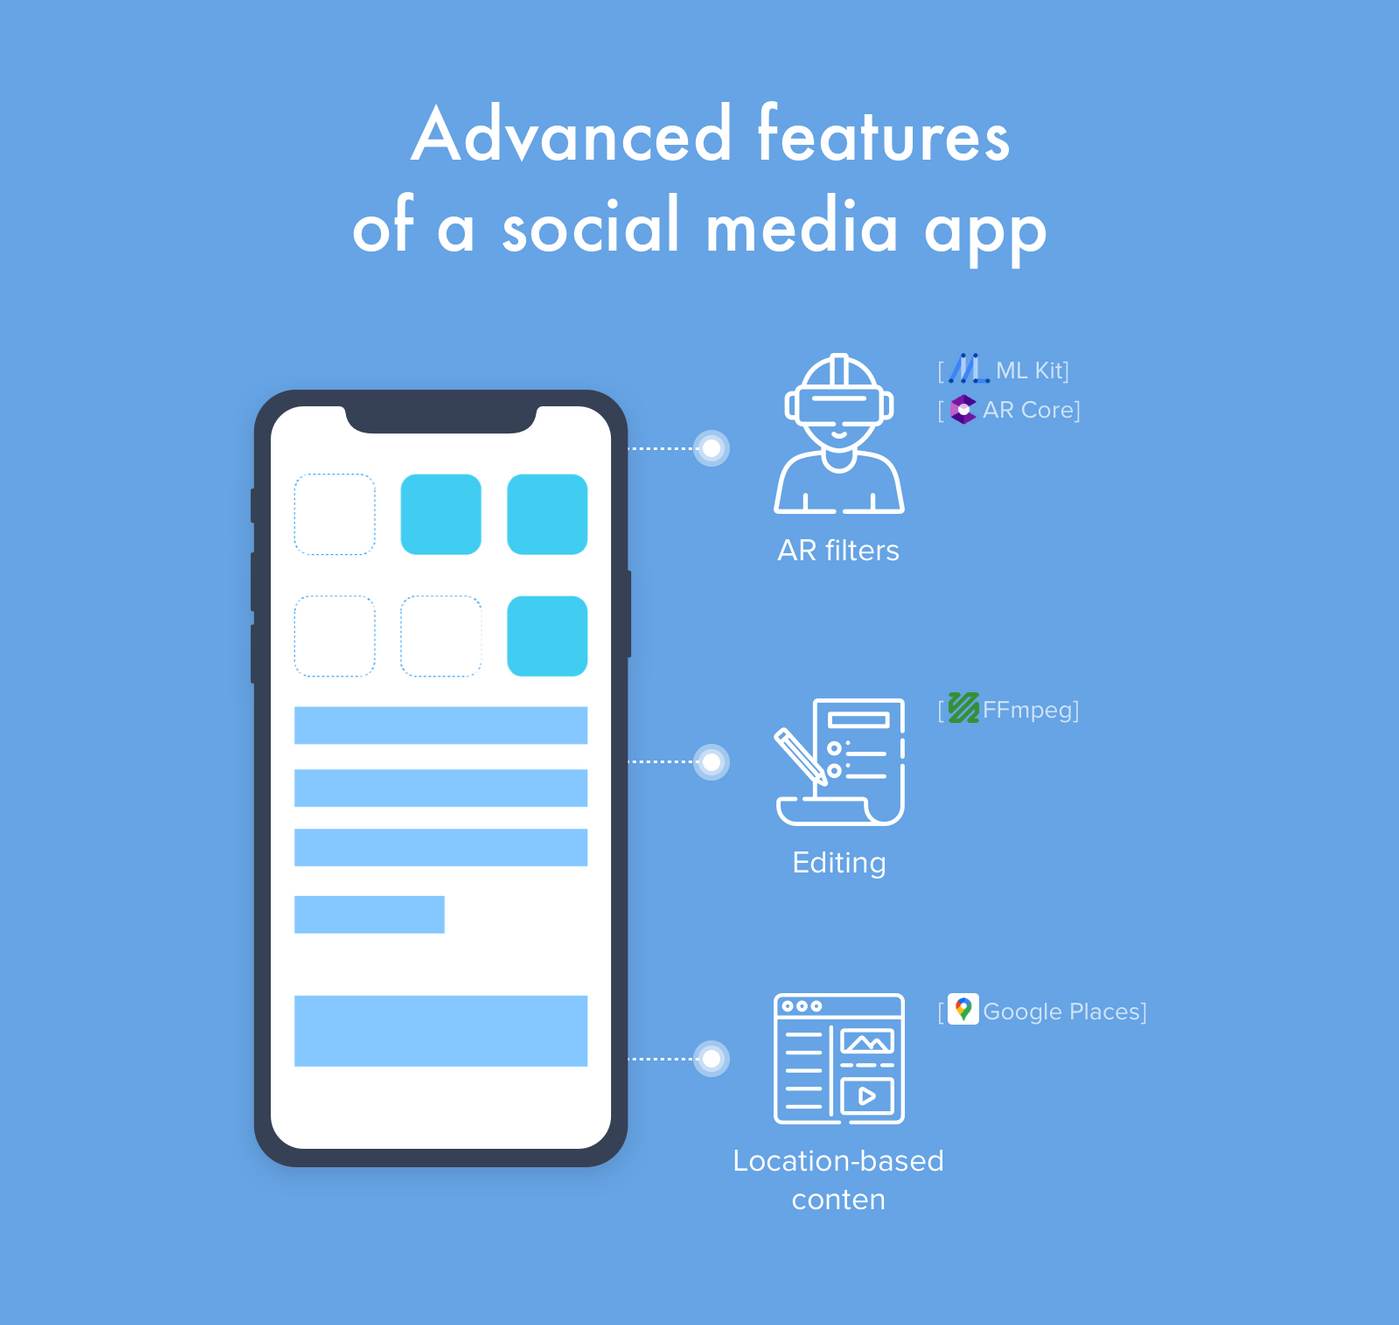 Social medai app development: Advanced features